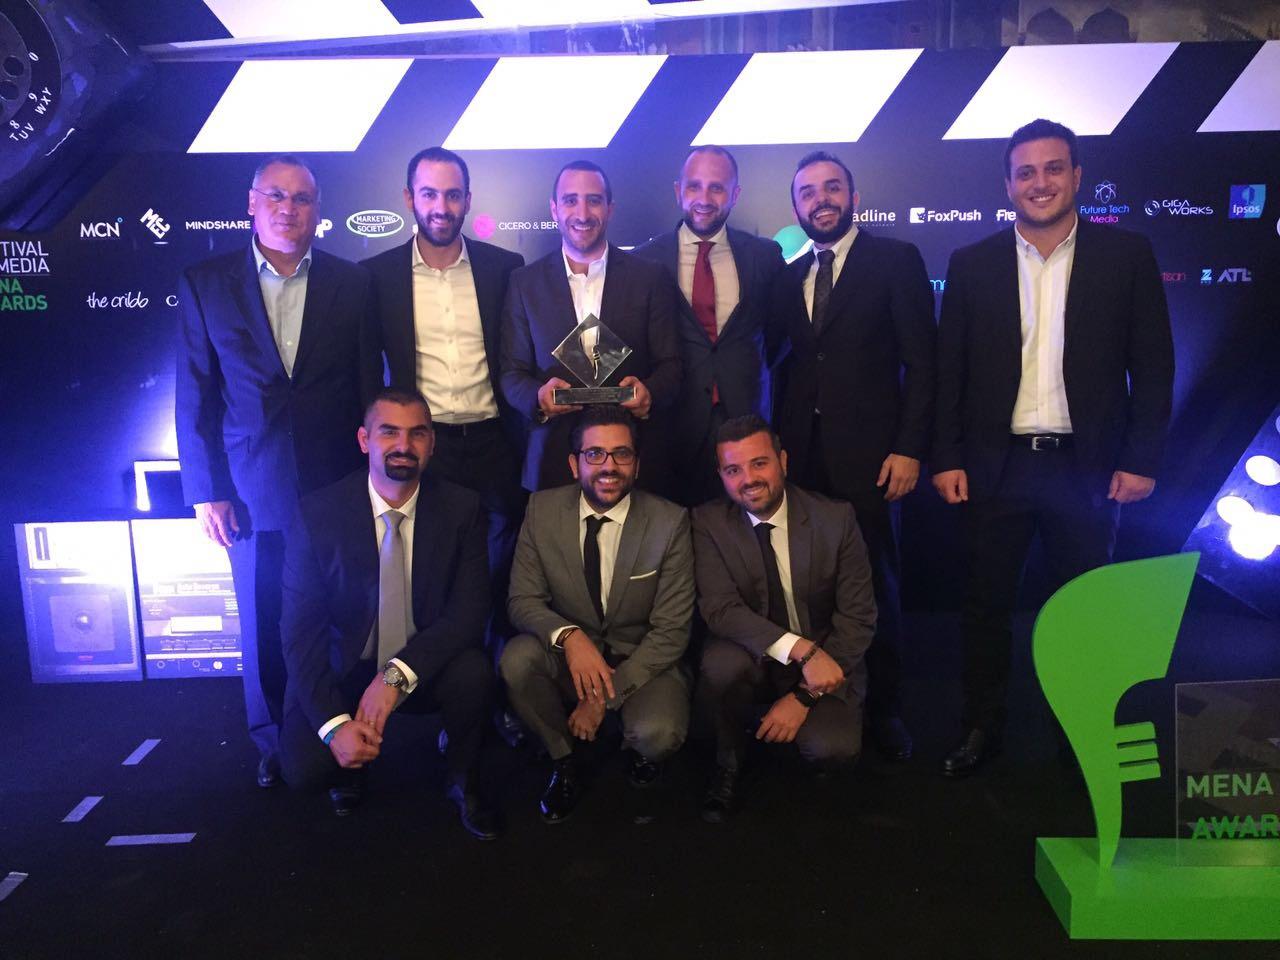 Nissan Wins Festival of media MENA Award for Navara Outreach Campaign